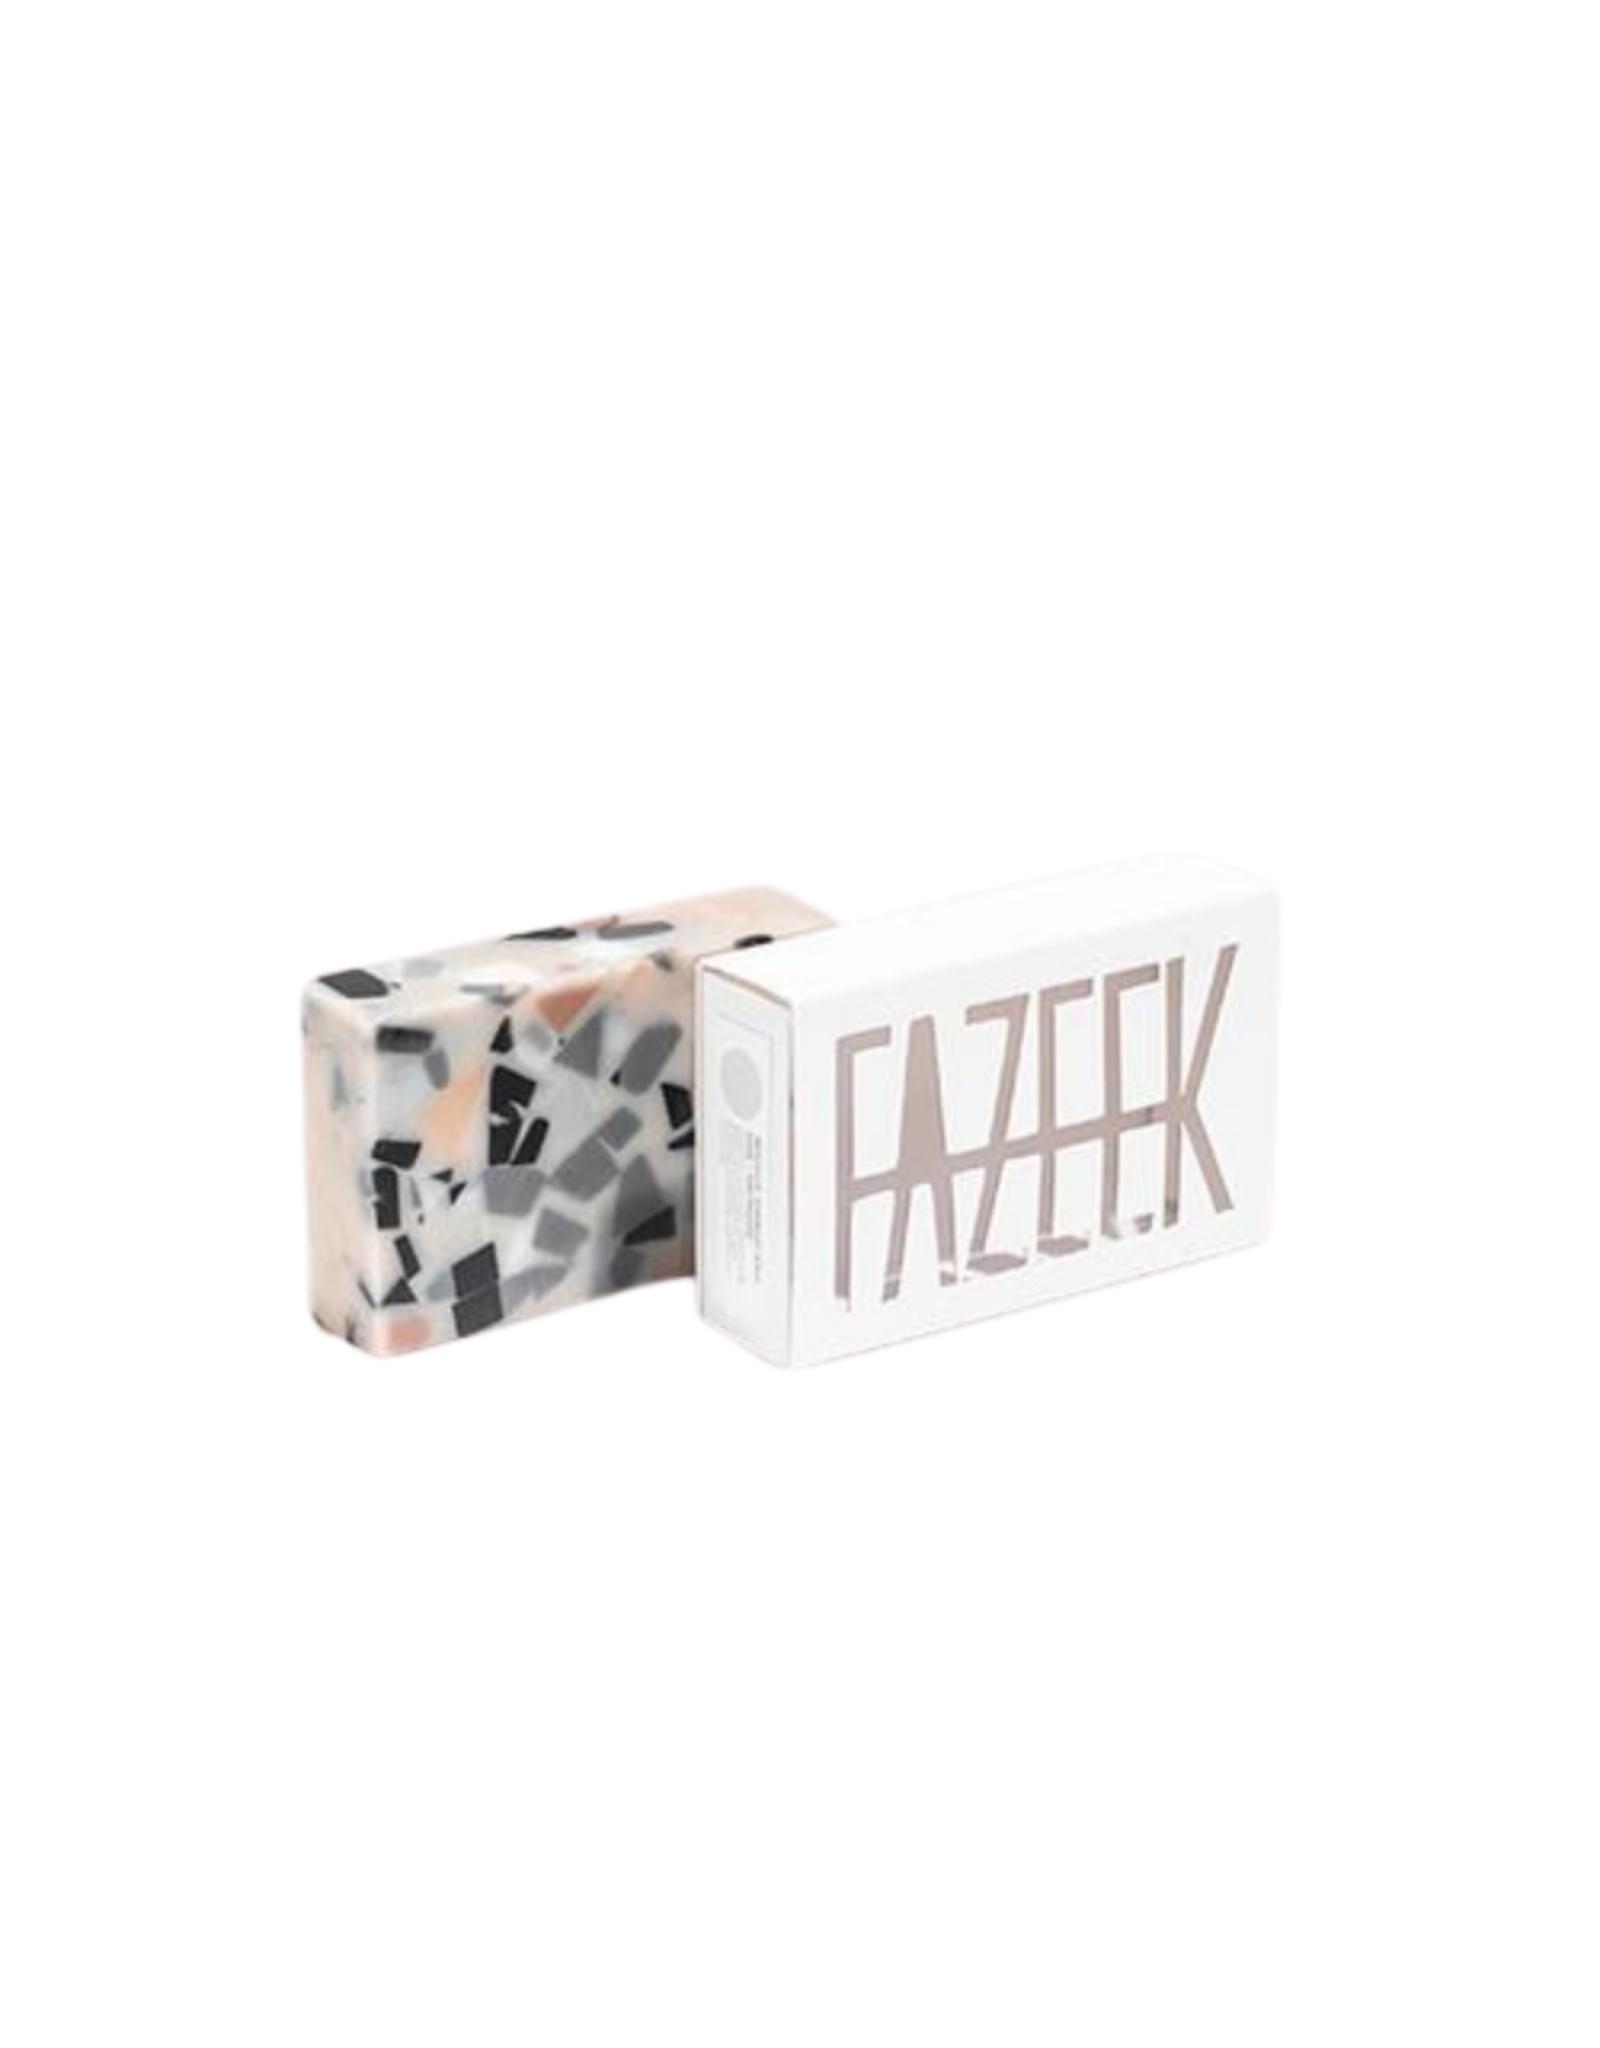 Fazeek Absolute Terrazzo Soap - Sage+Driftwood